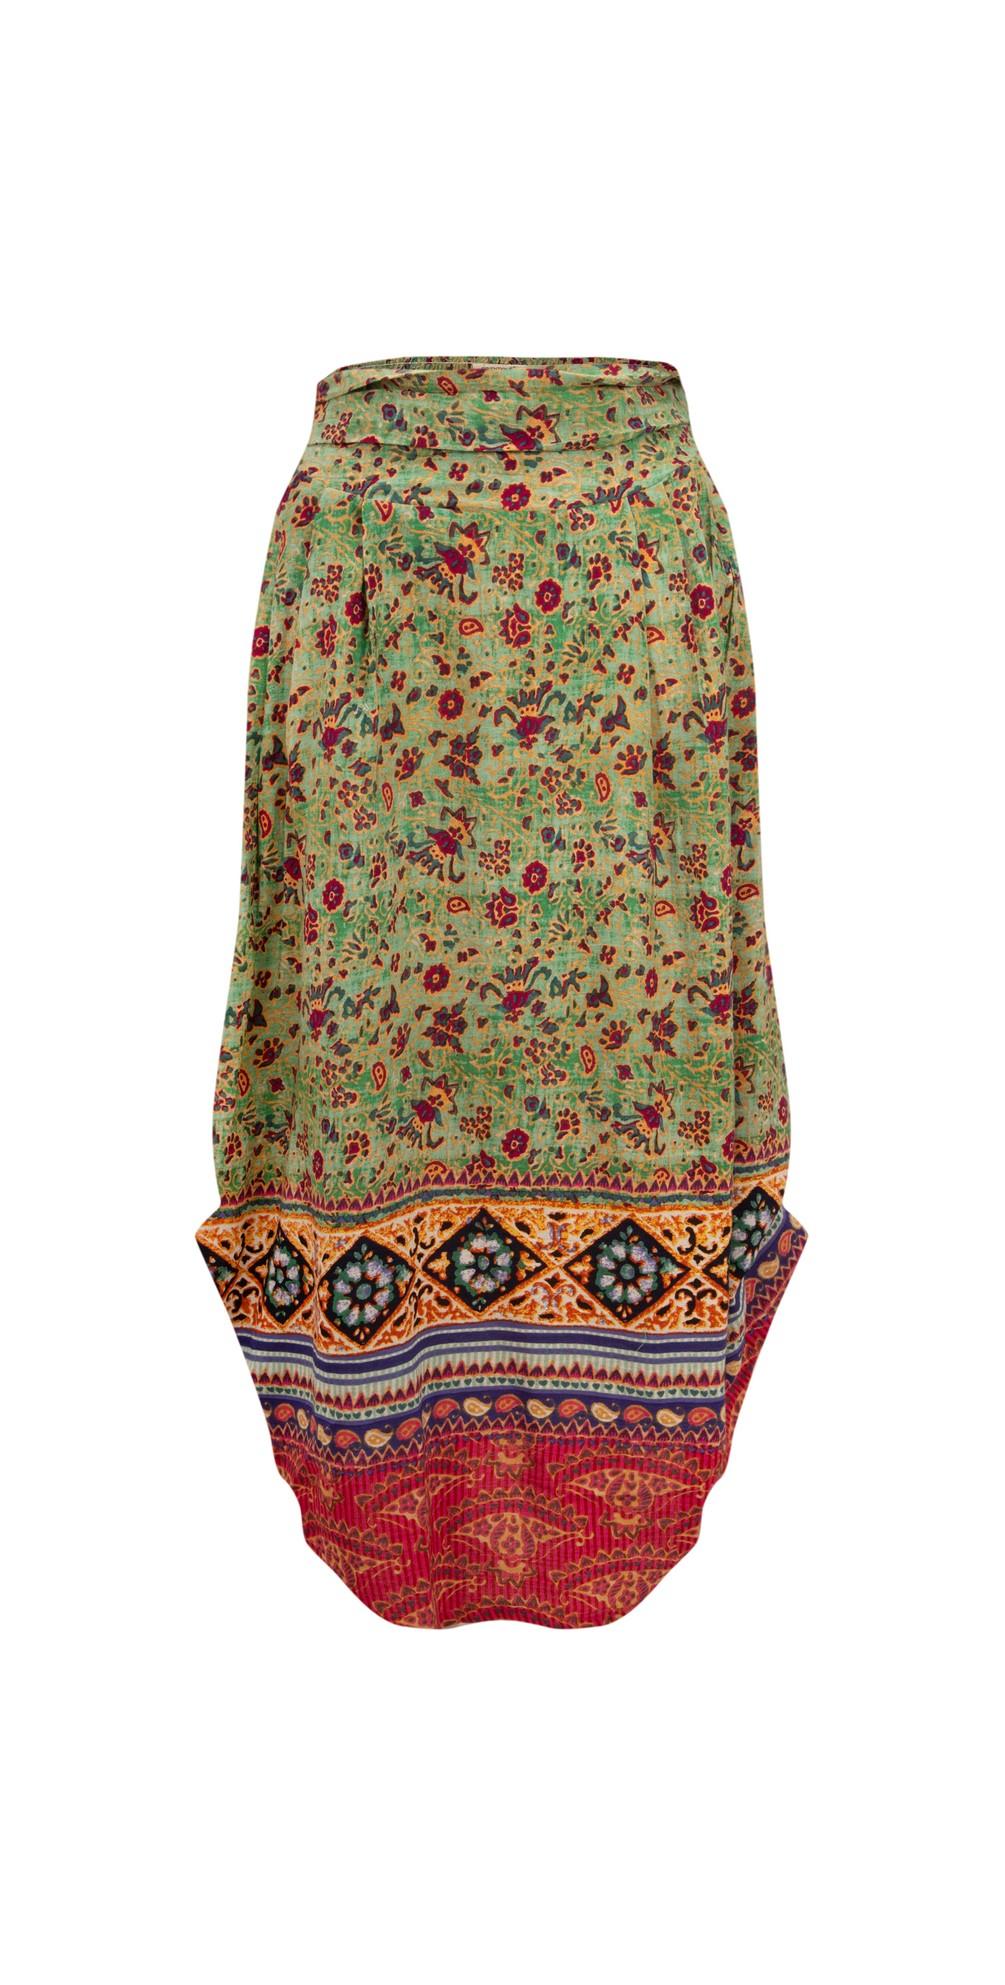 Kea Skirt main image